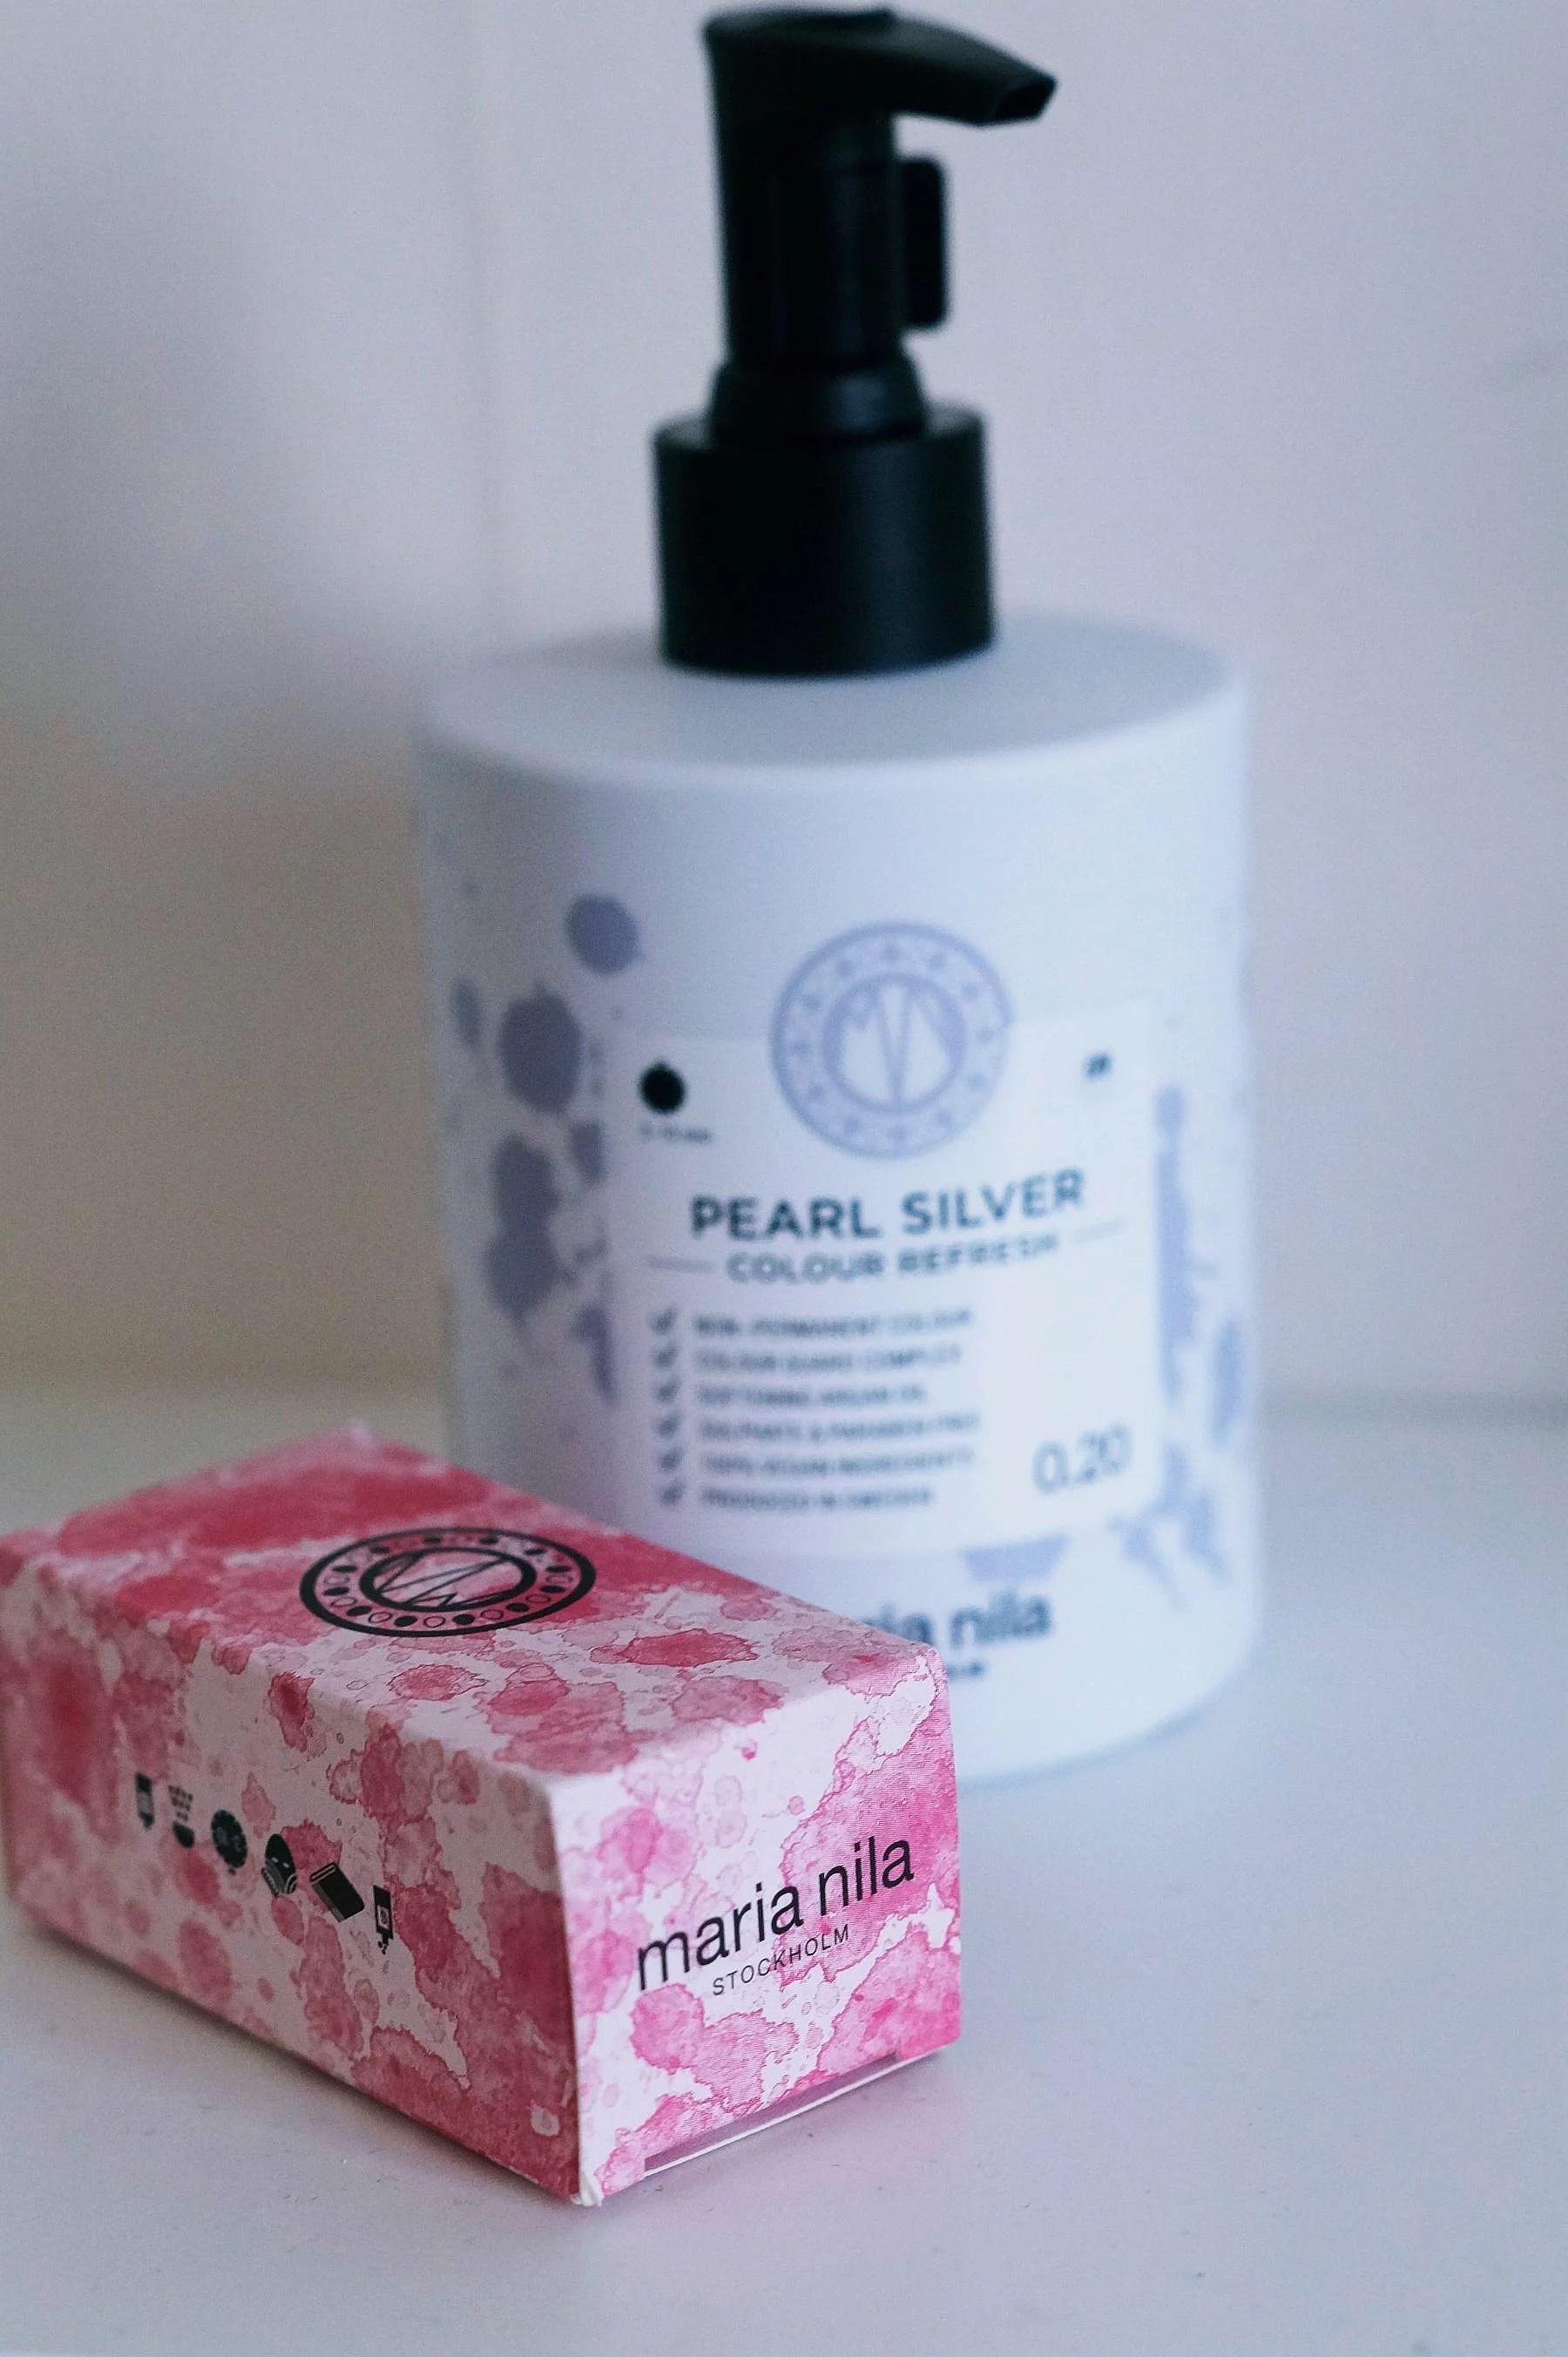 Maria Nila pearl silver